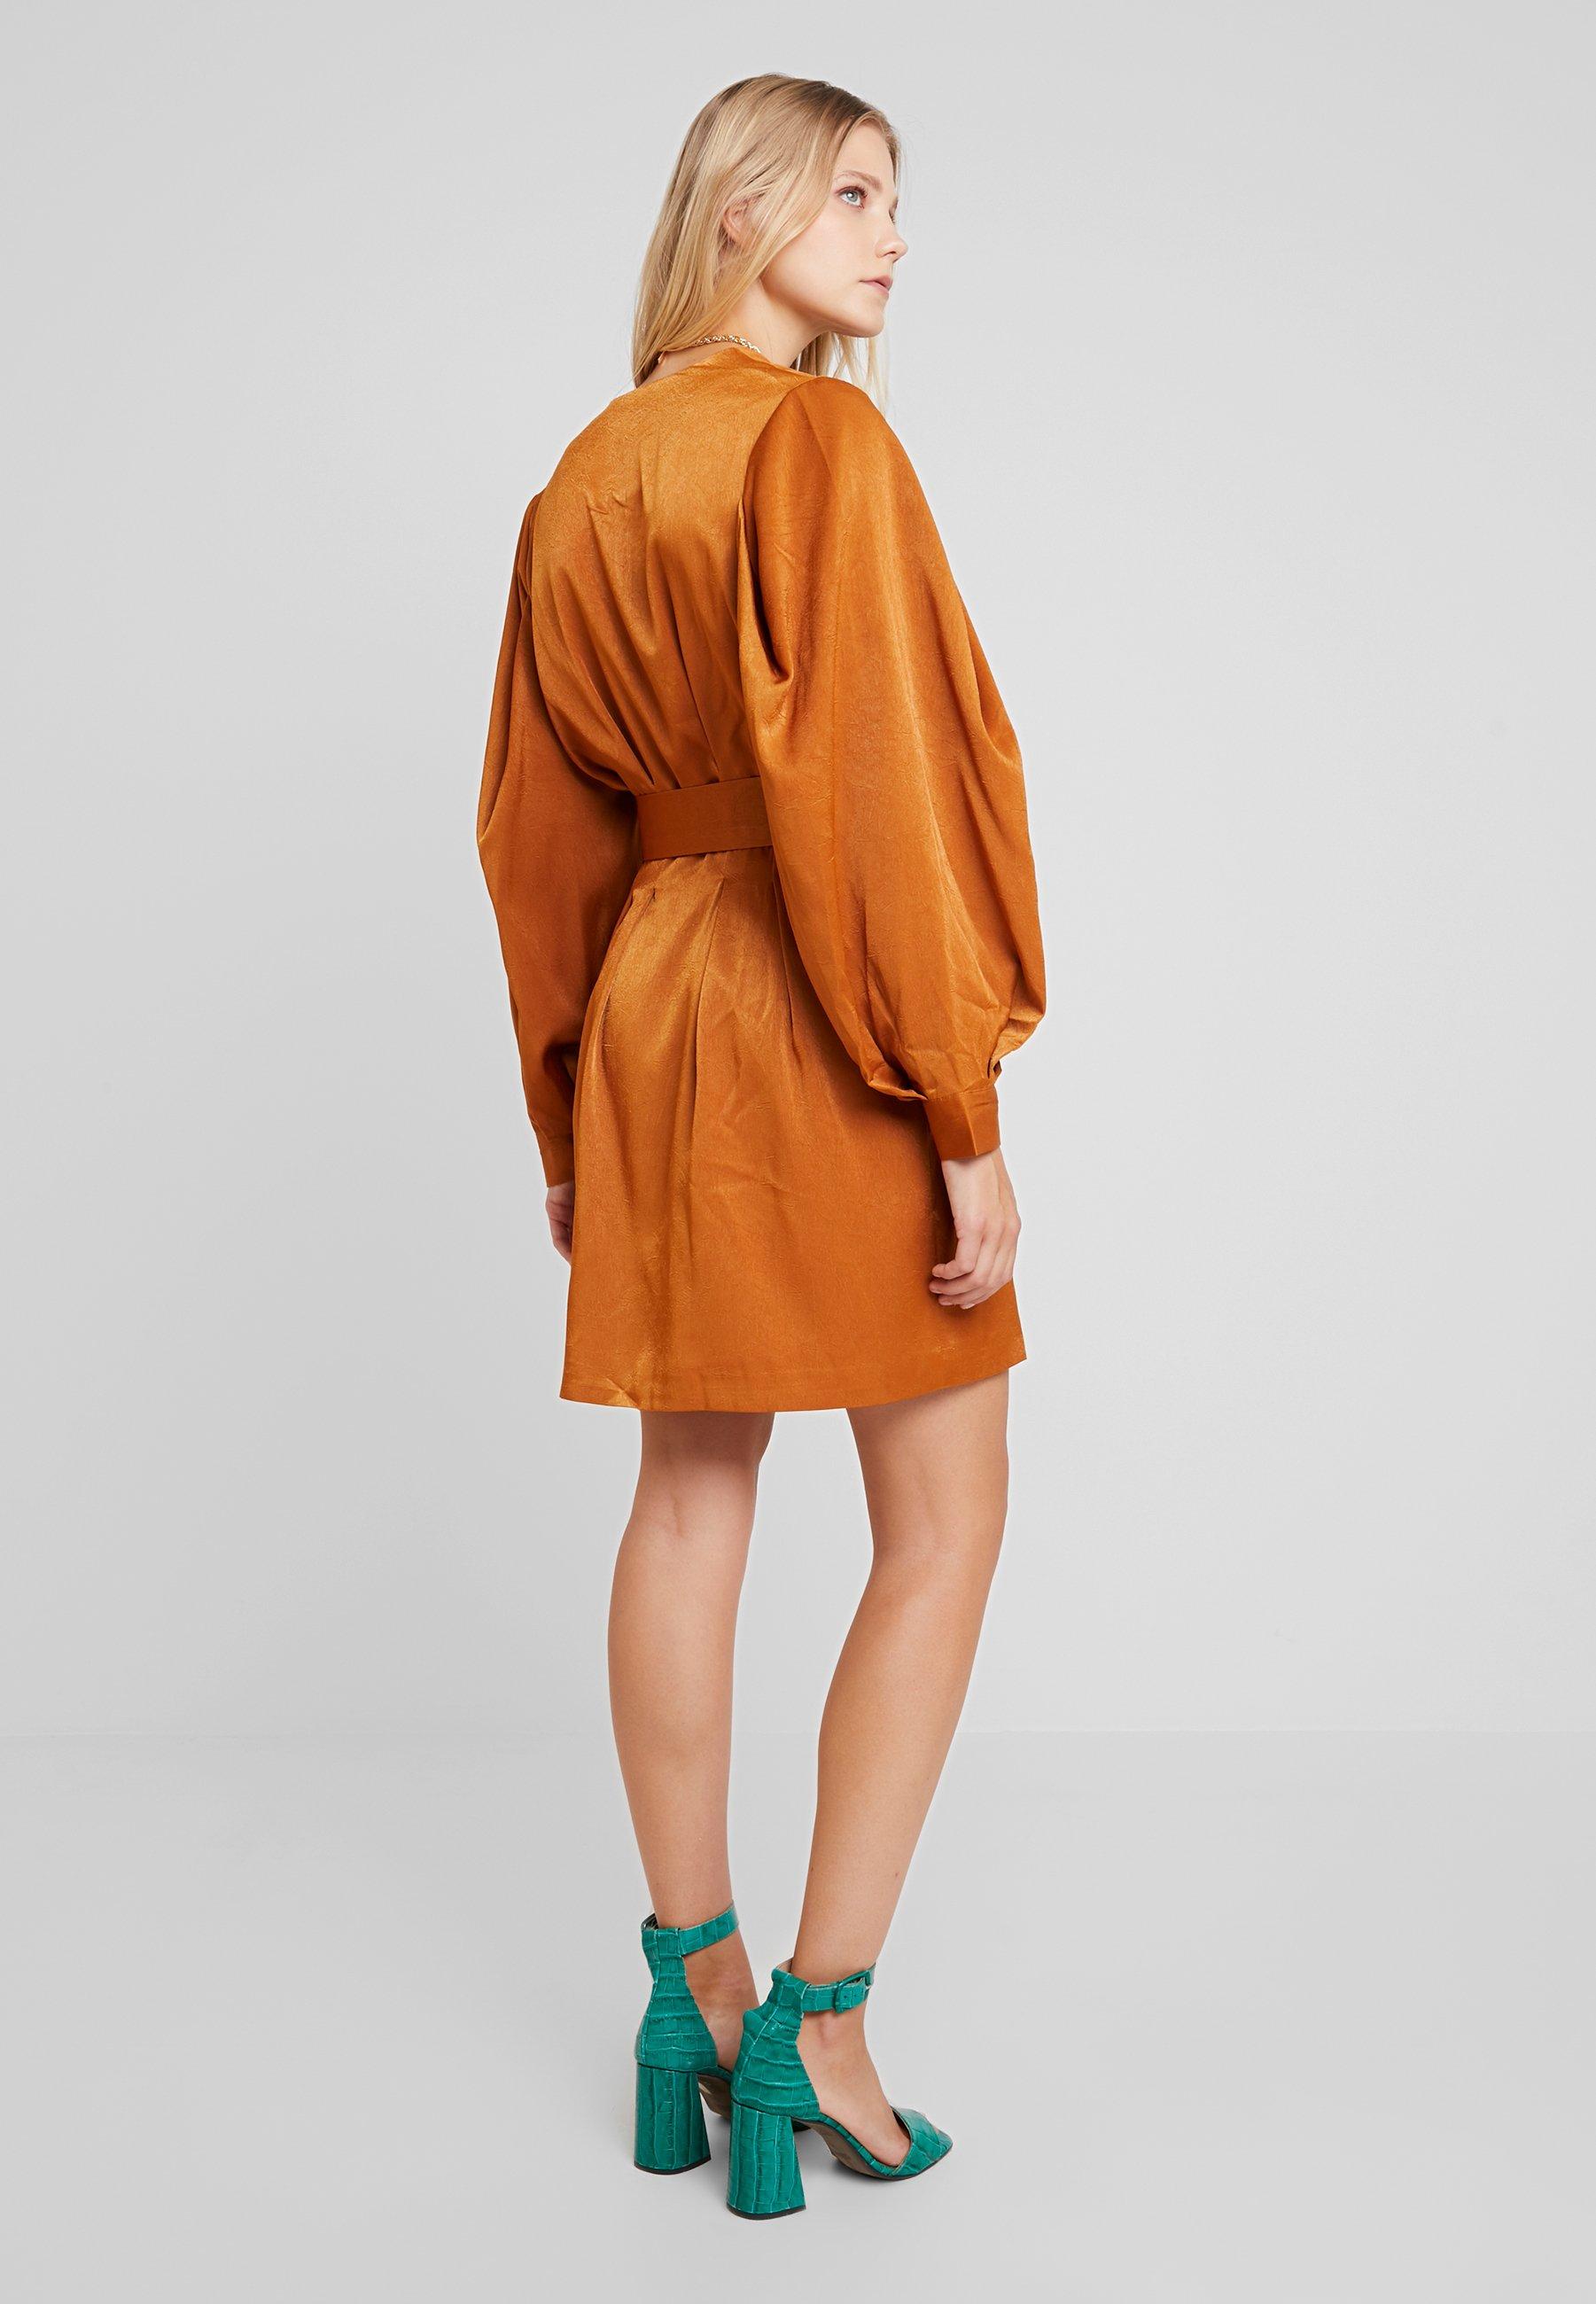 Wrap Unique DressRobe Chemise Luxe 21 Belted Camel ZikOPXu